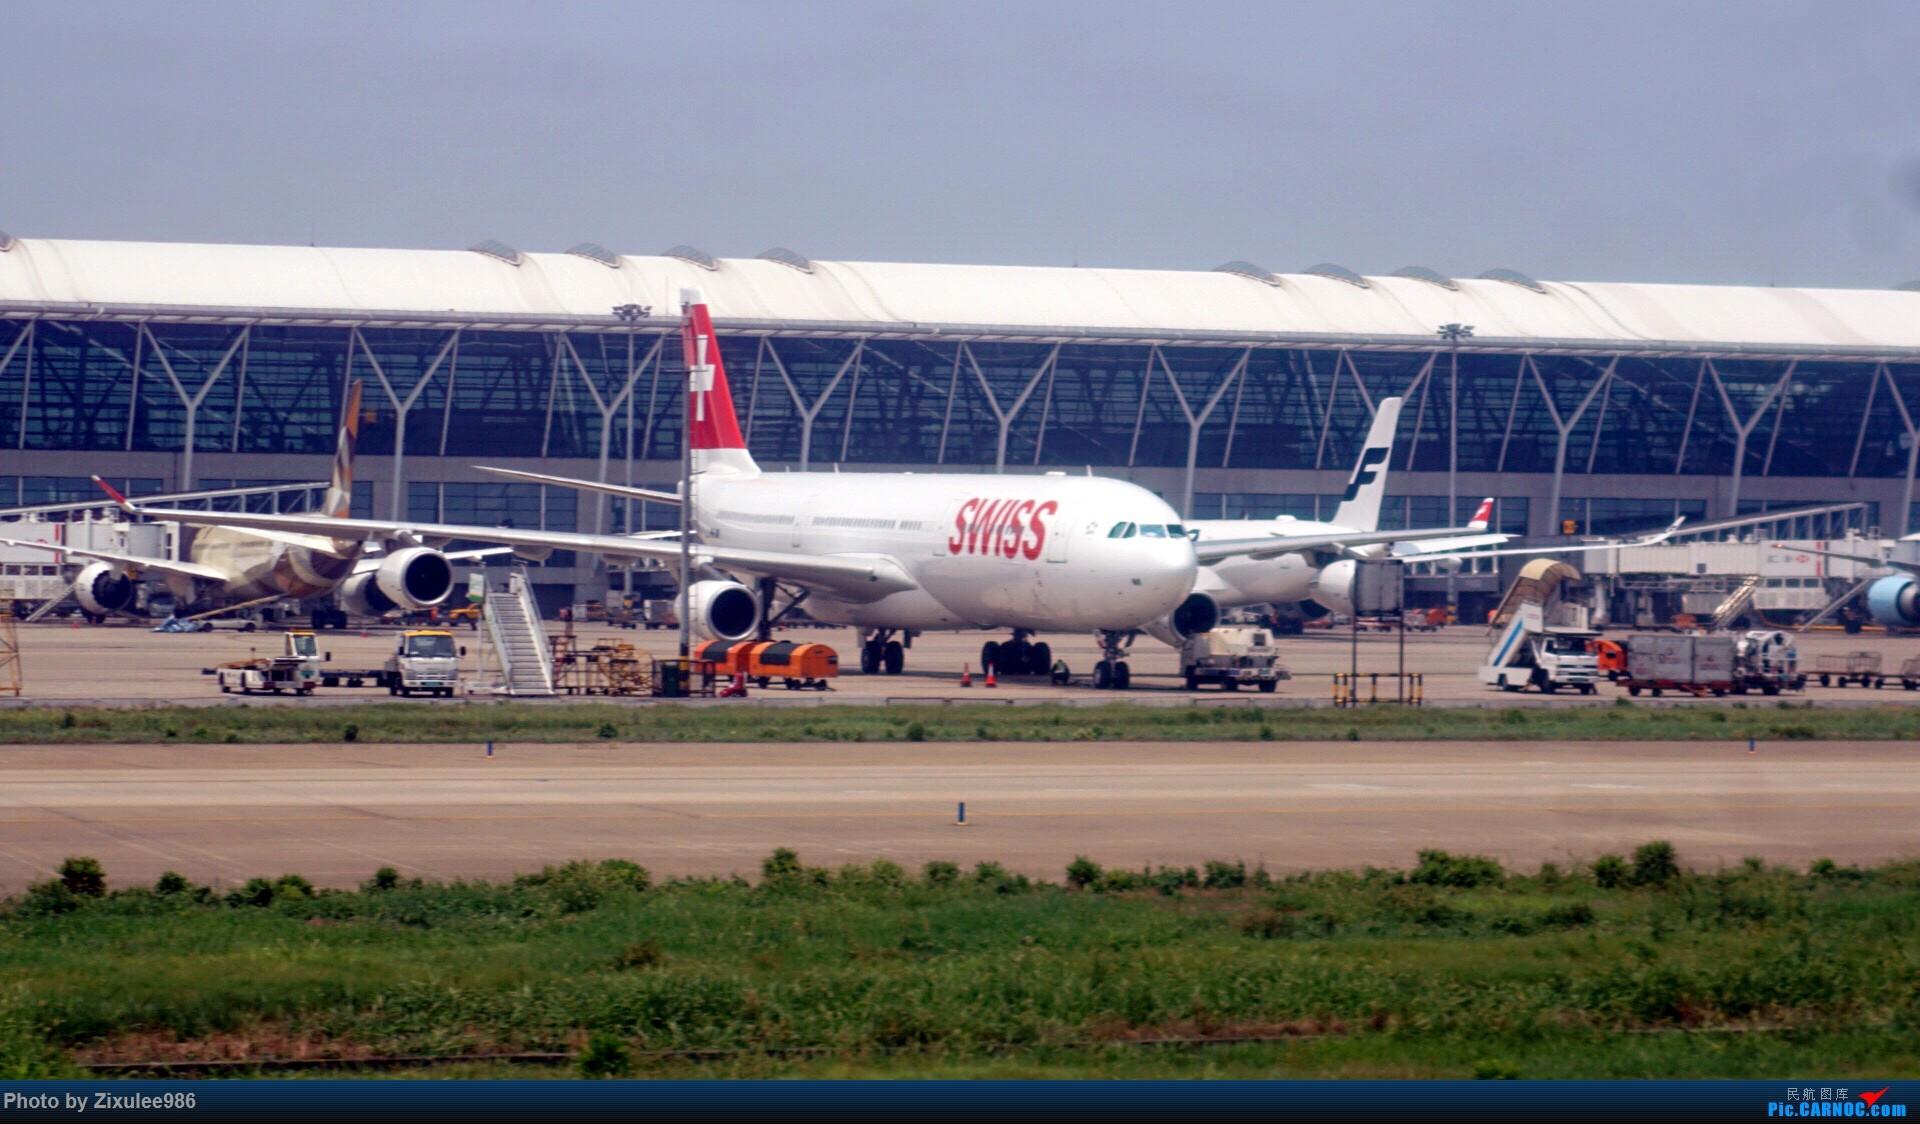 Re:[原创]加拿大21日游学之旅(一)~JJN-PVG-YYZ..(内含flightlog)~第一次发游记~多图缓更请谅解 AIRBUS A340-313X HB-JMF 中国上海浦东国际机场